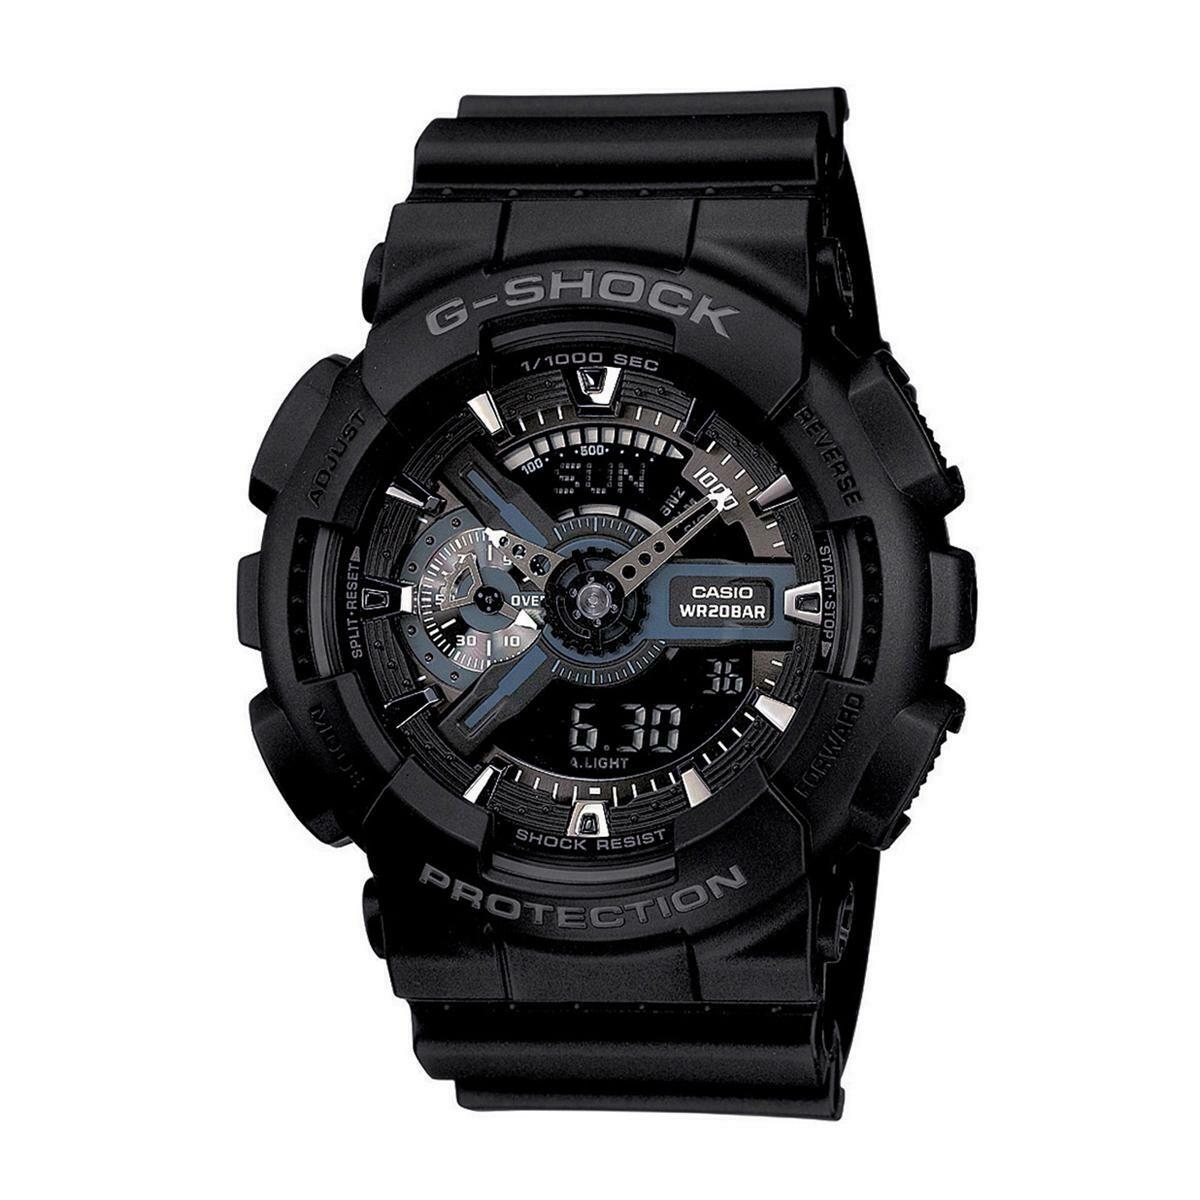 Casio G-Shock GA-110-1BDR Analog-Digital Watch for Men -Black